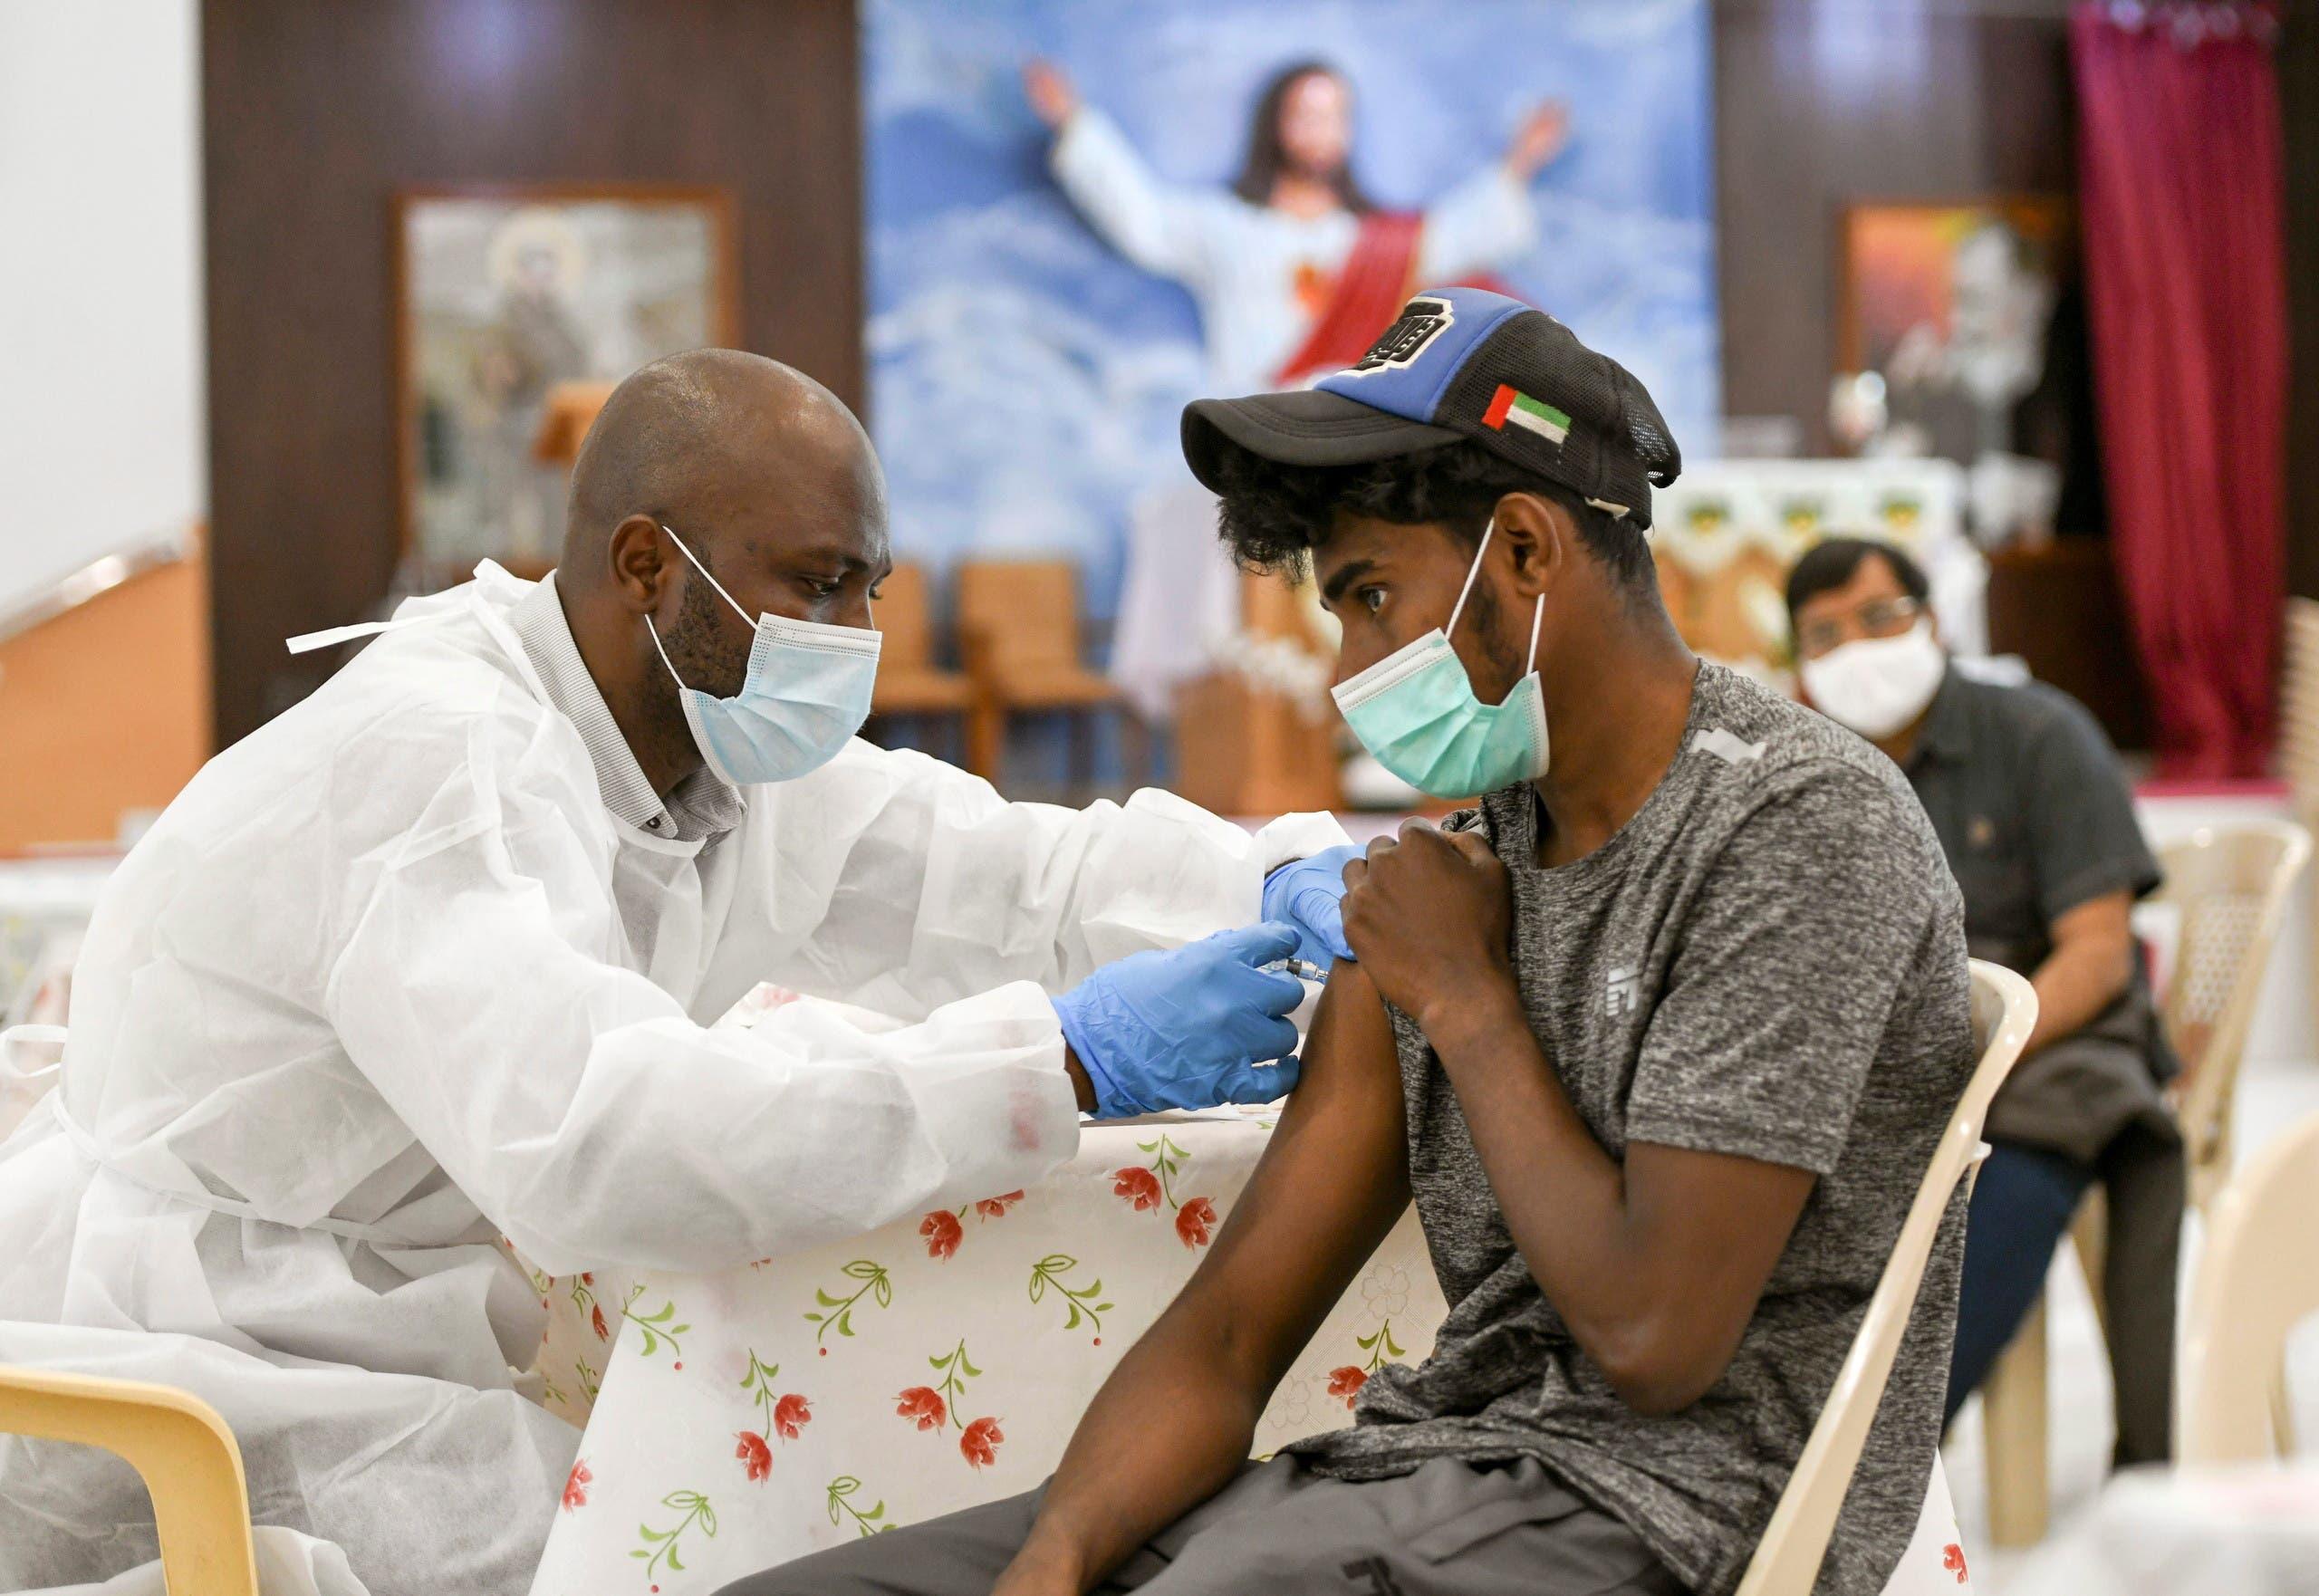 A man receives a dose of a vaccine against the coronavirus disease (COVID-19) at St. Paul's Church in Abu Dhabi, UAE. (Reuters)